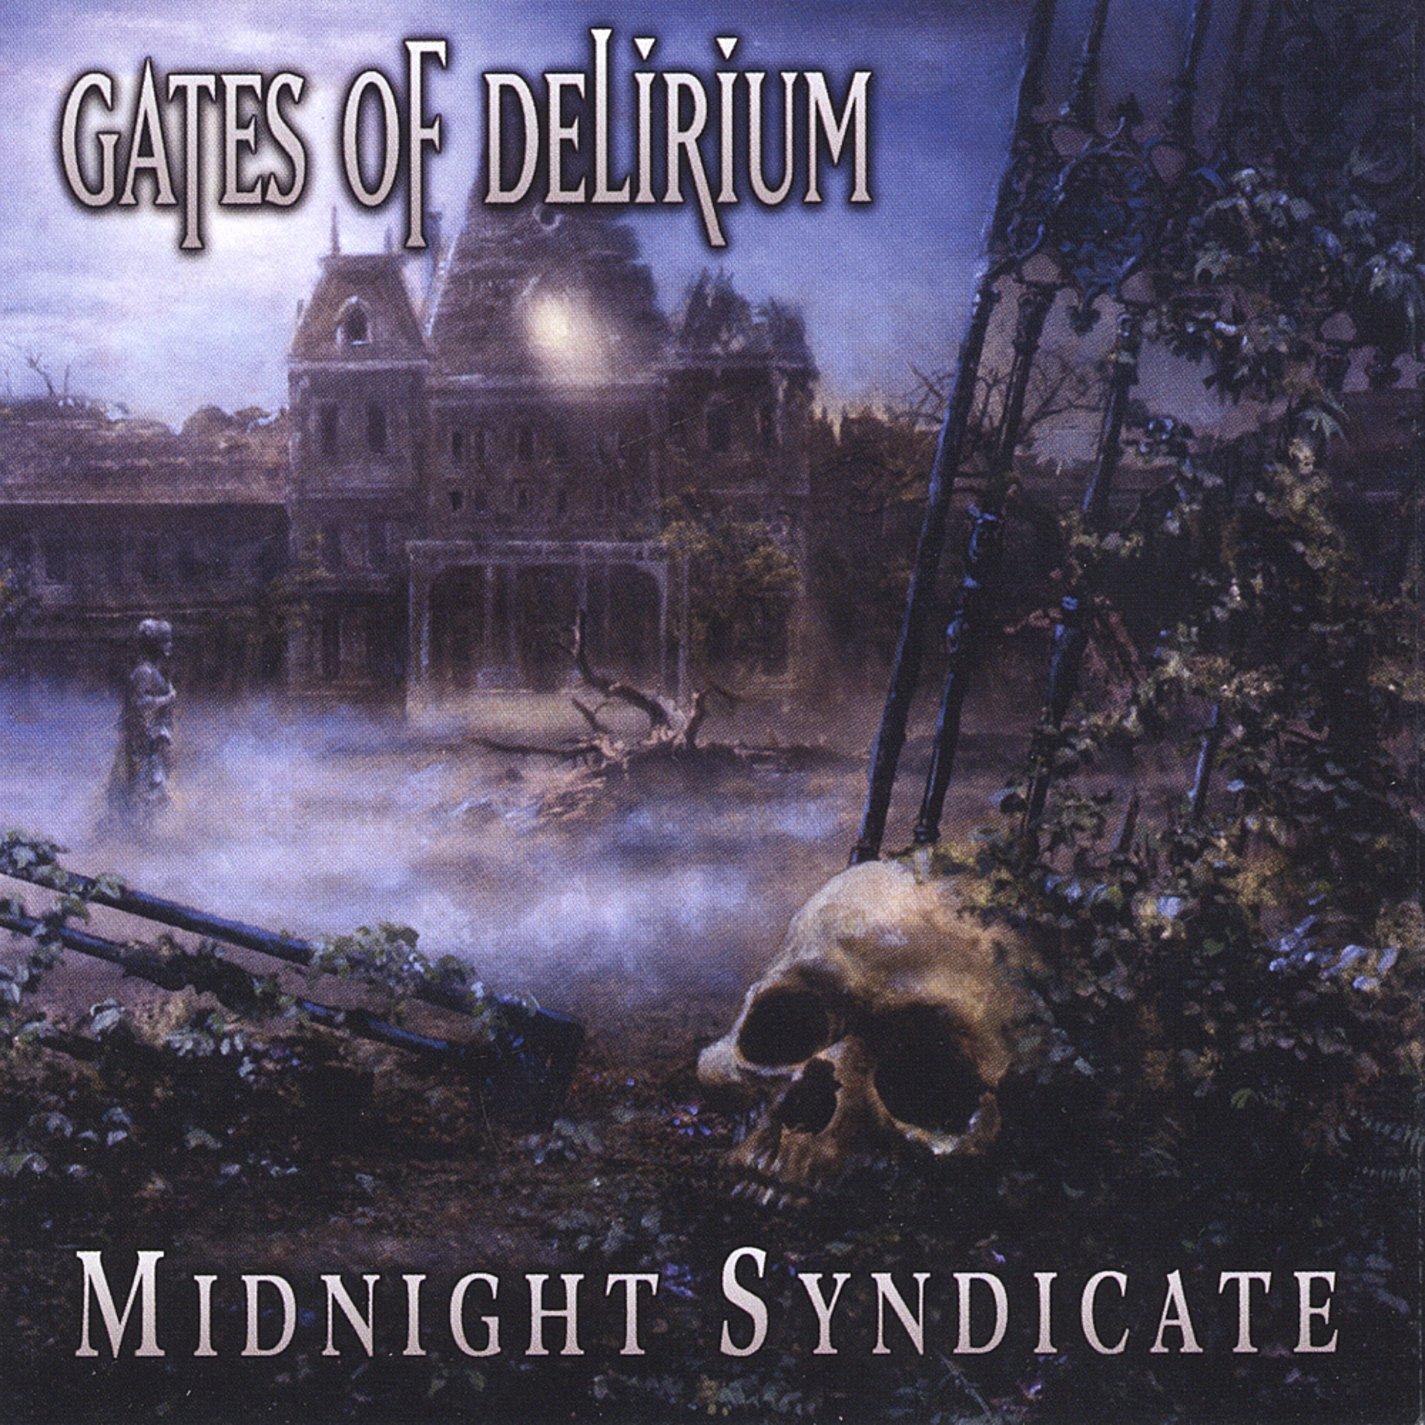 Midnight Syndicate - Gates of Delirium (CD)